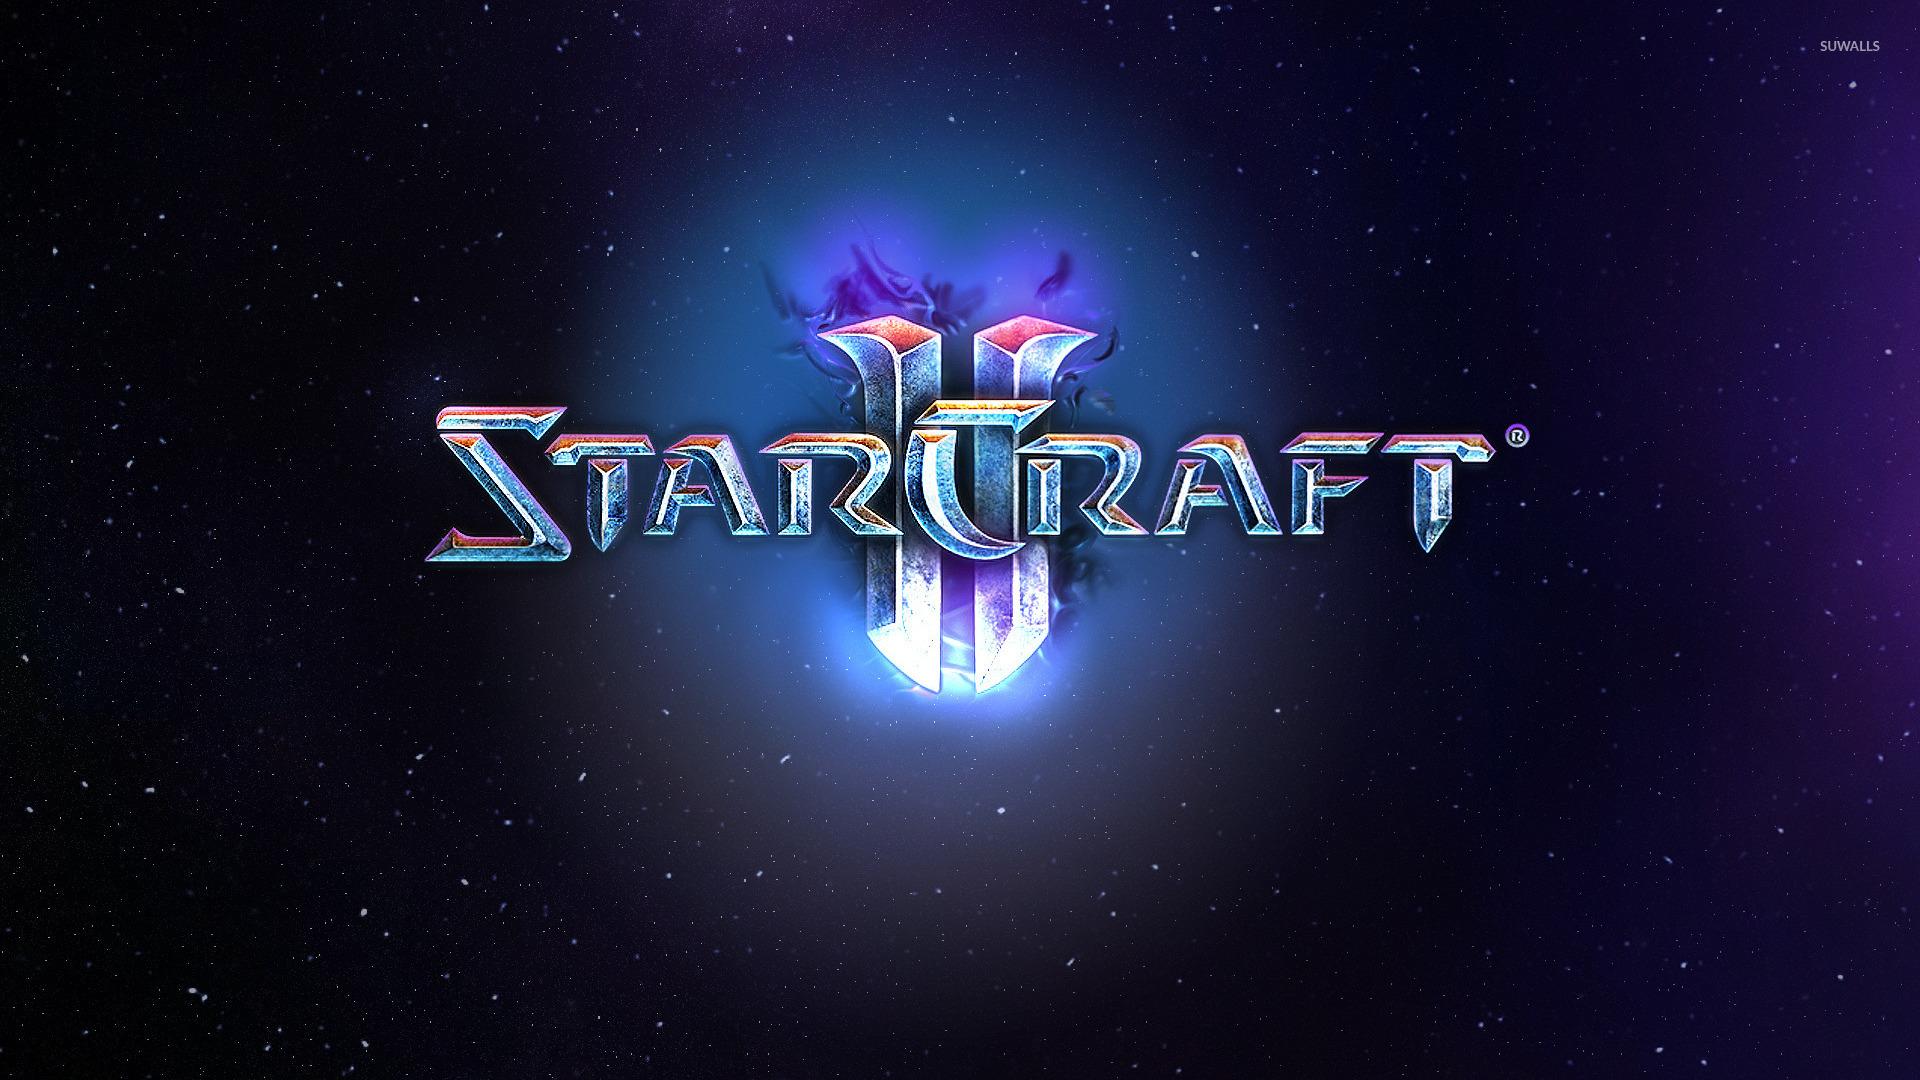 Starcraft 2 wallpaper   Game wallpapers   786 1920x1080